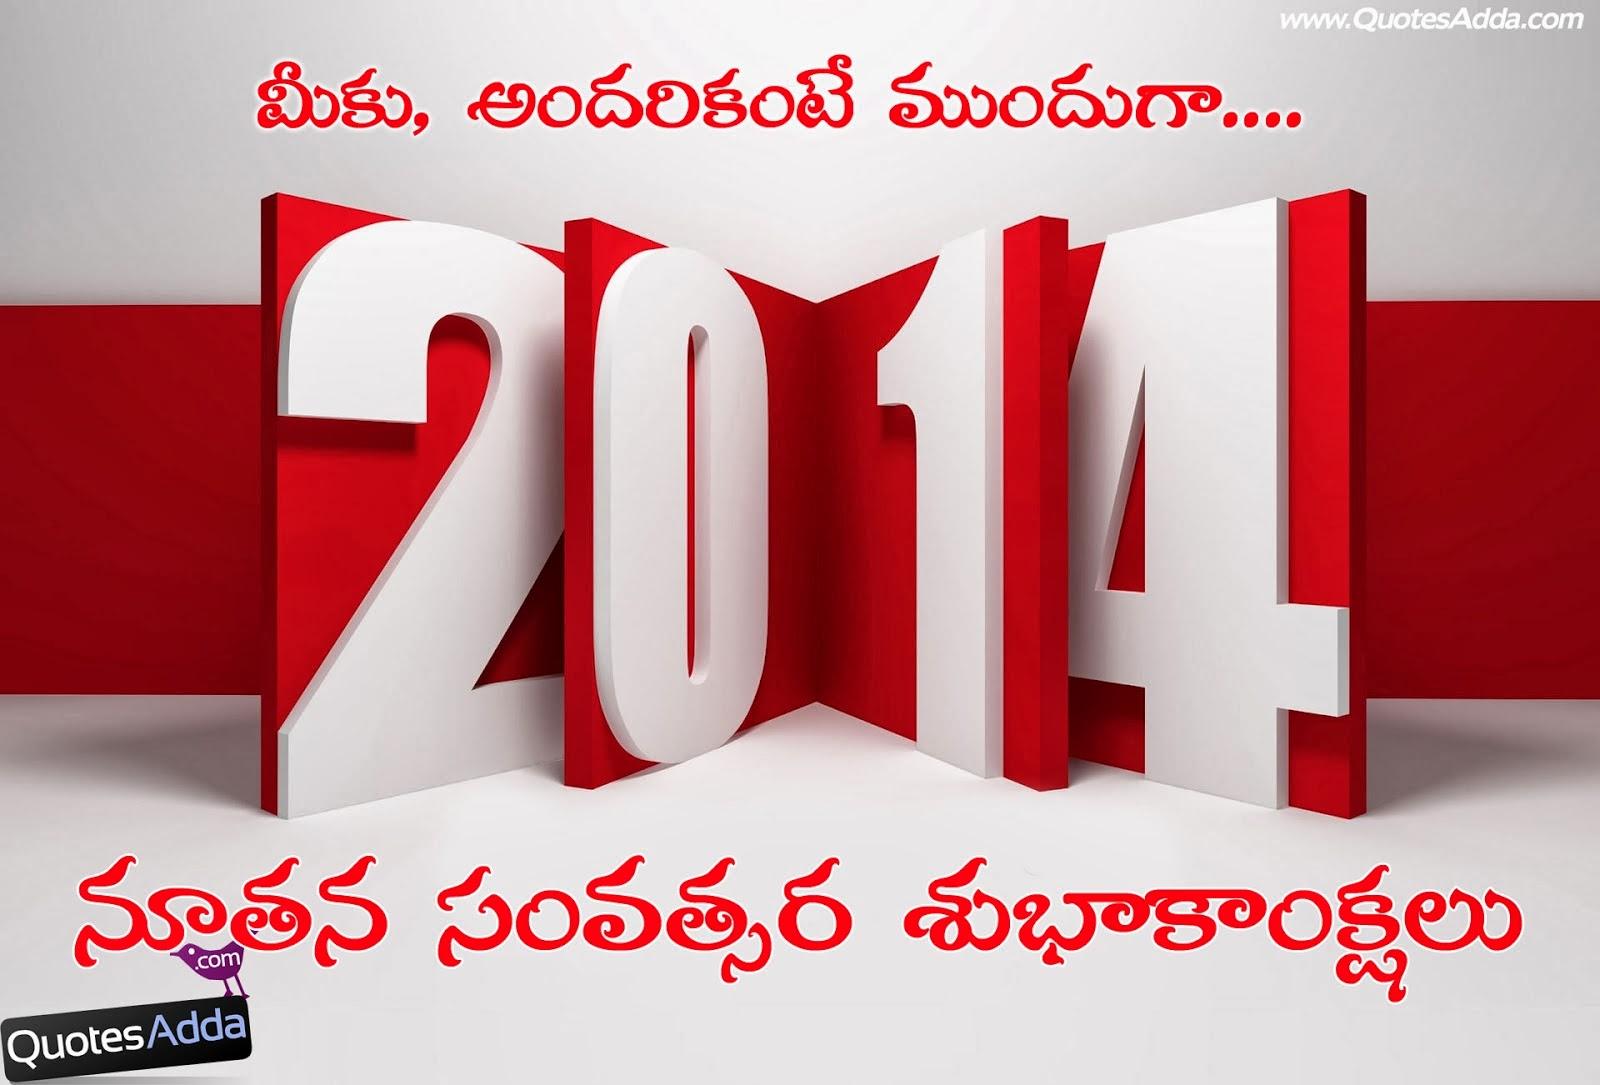 New Year 2014 Greetings In Telugu